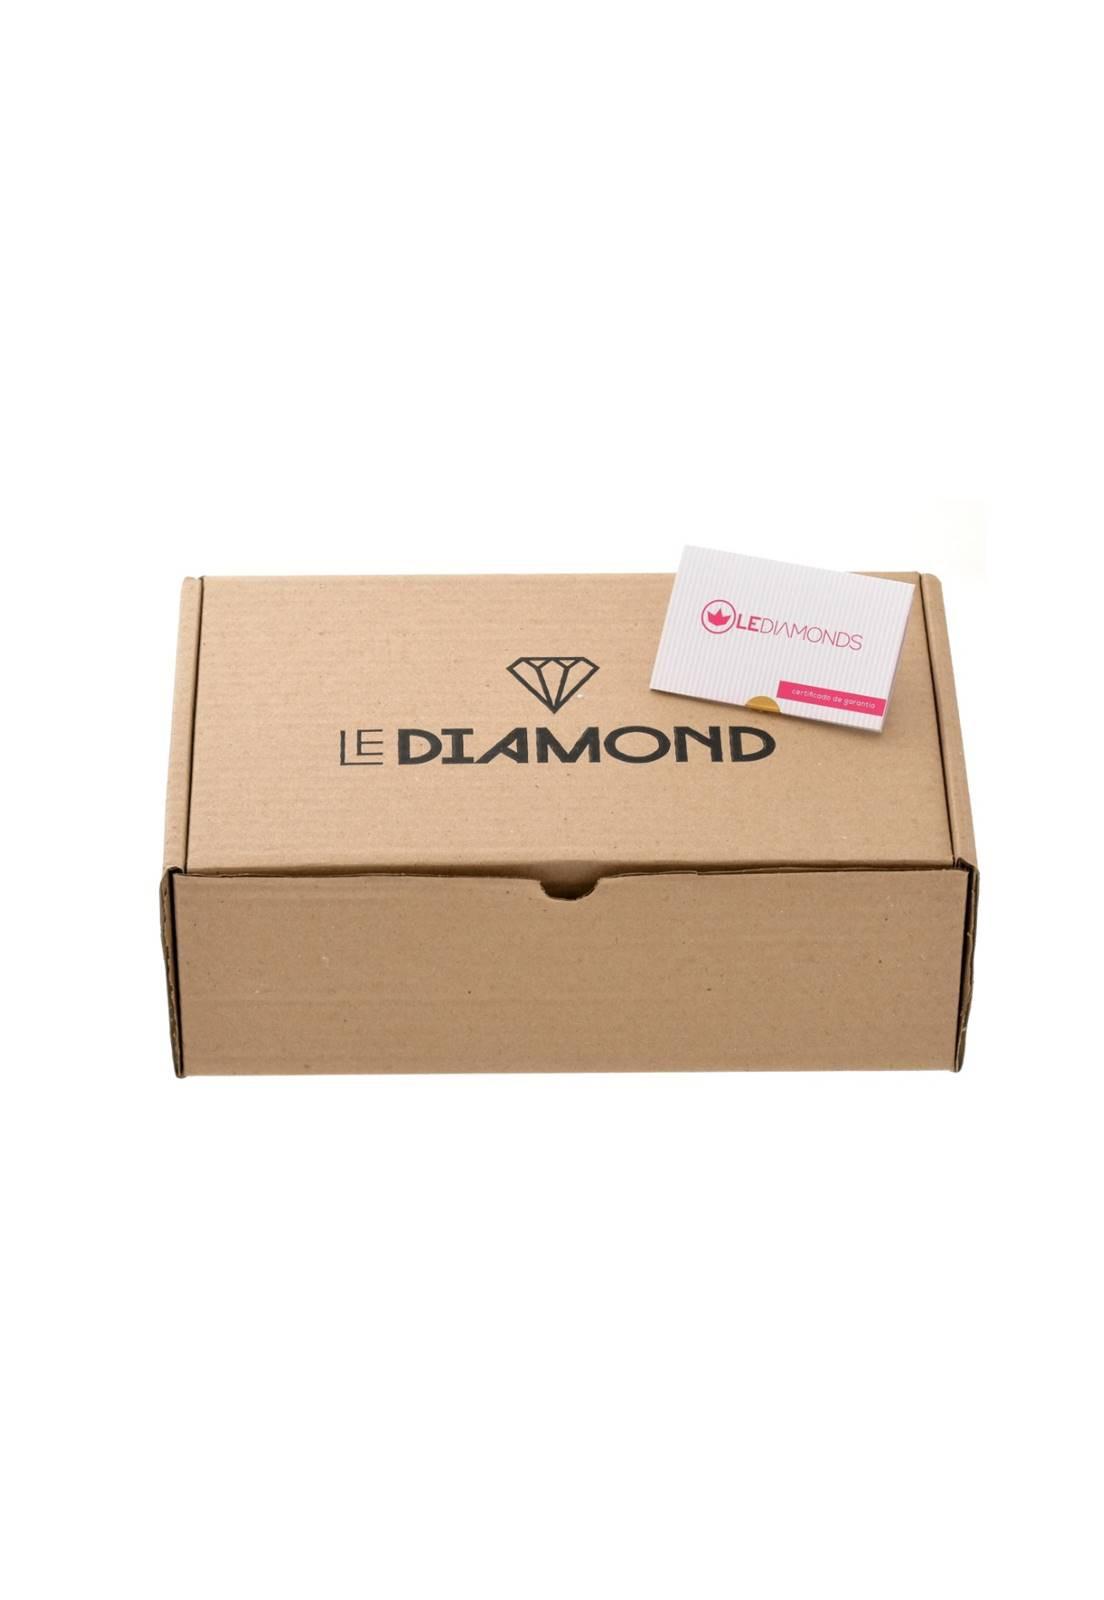 Brinco Le Diamond Flor Madre Pérola Com Base Metal